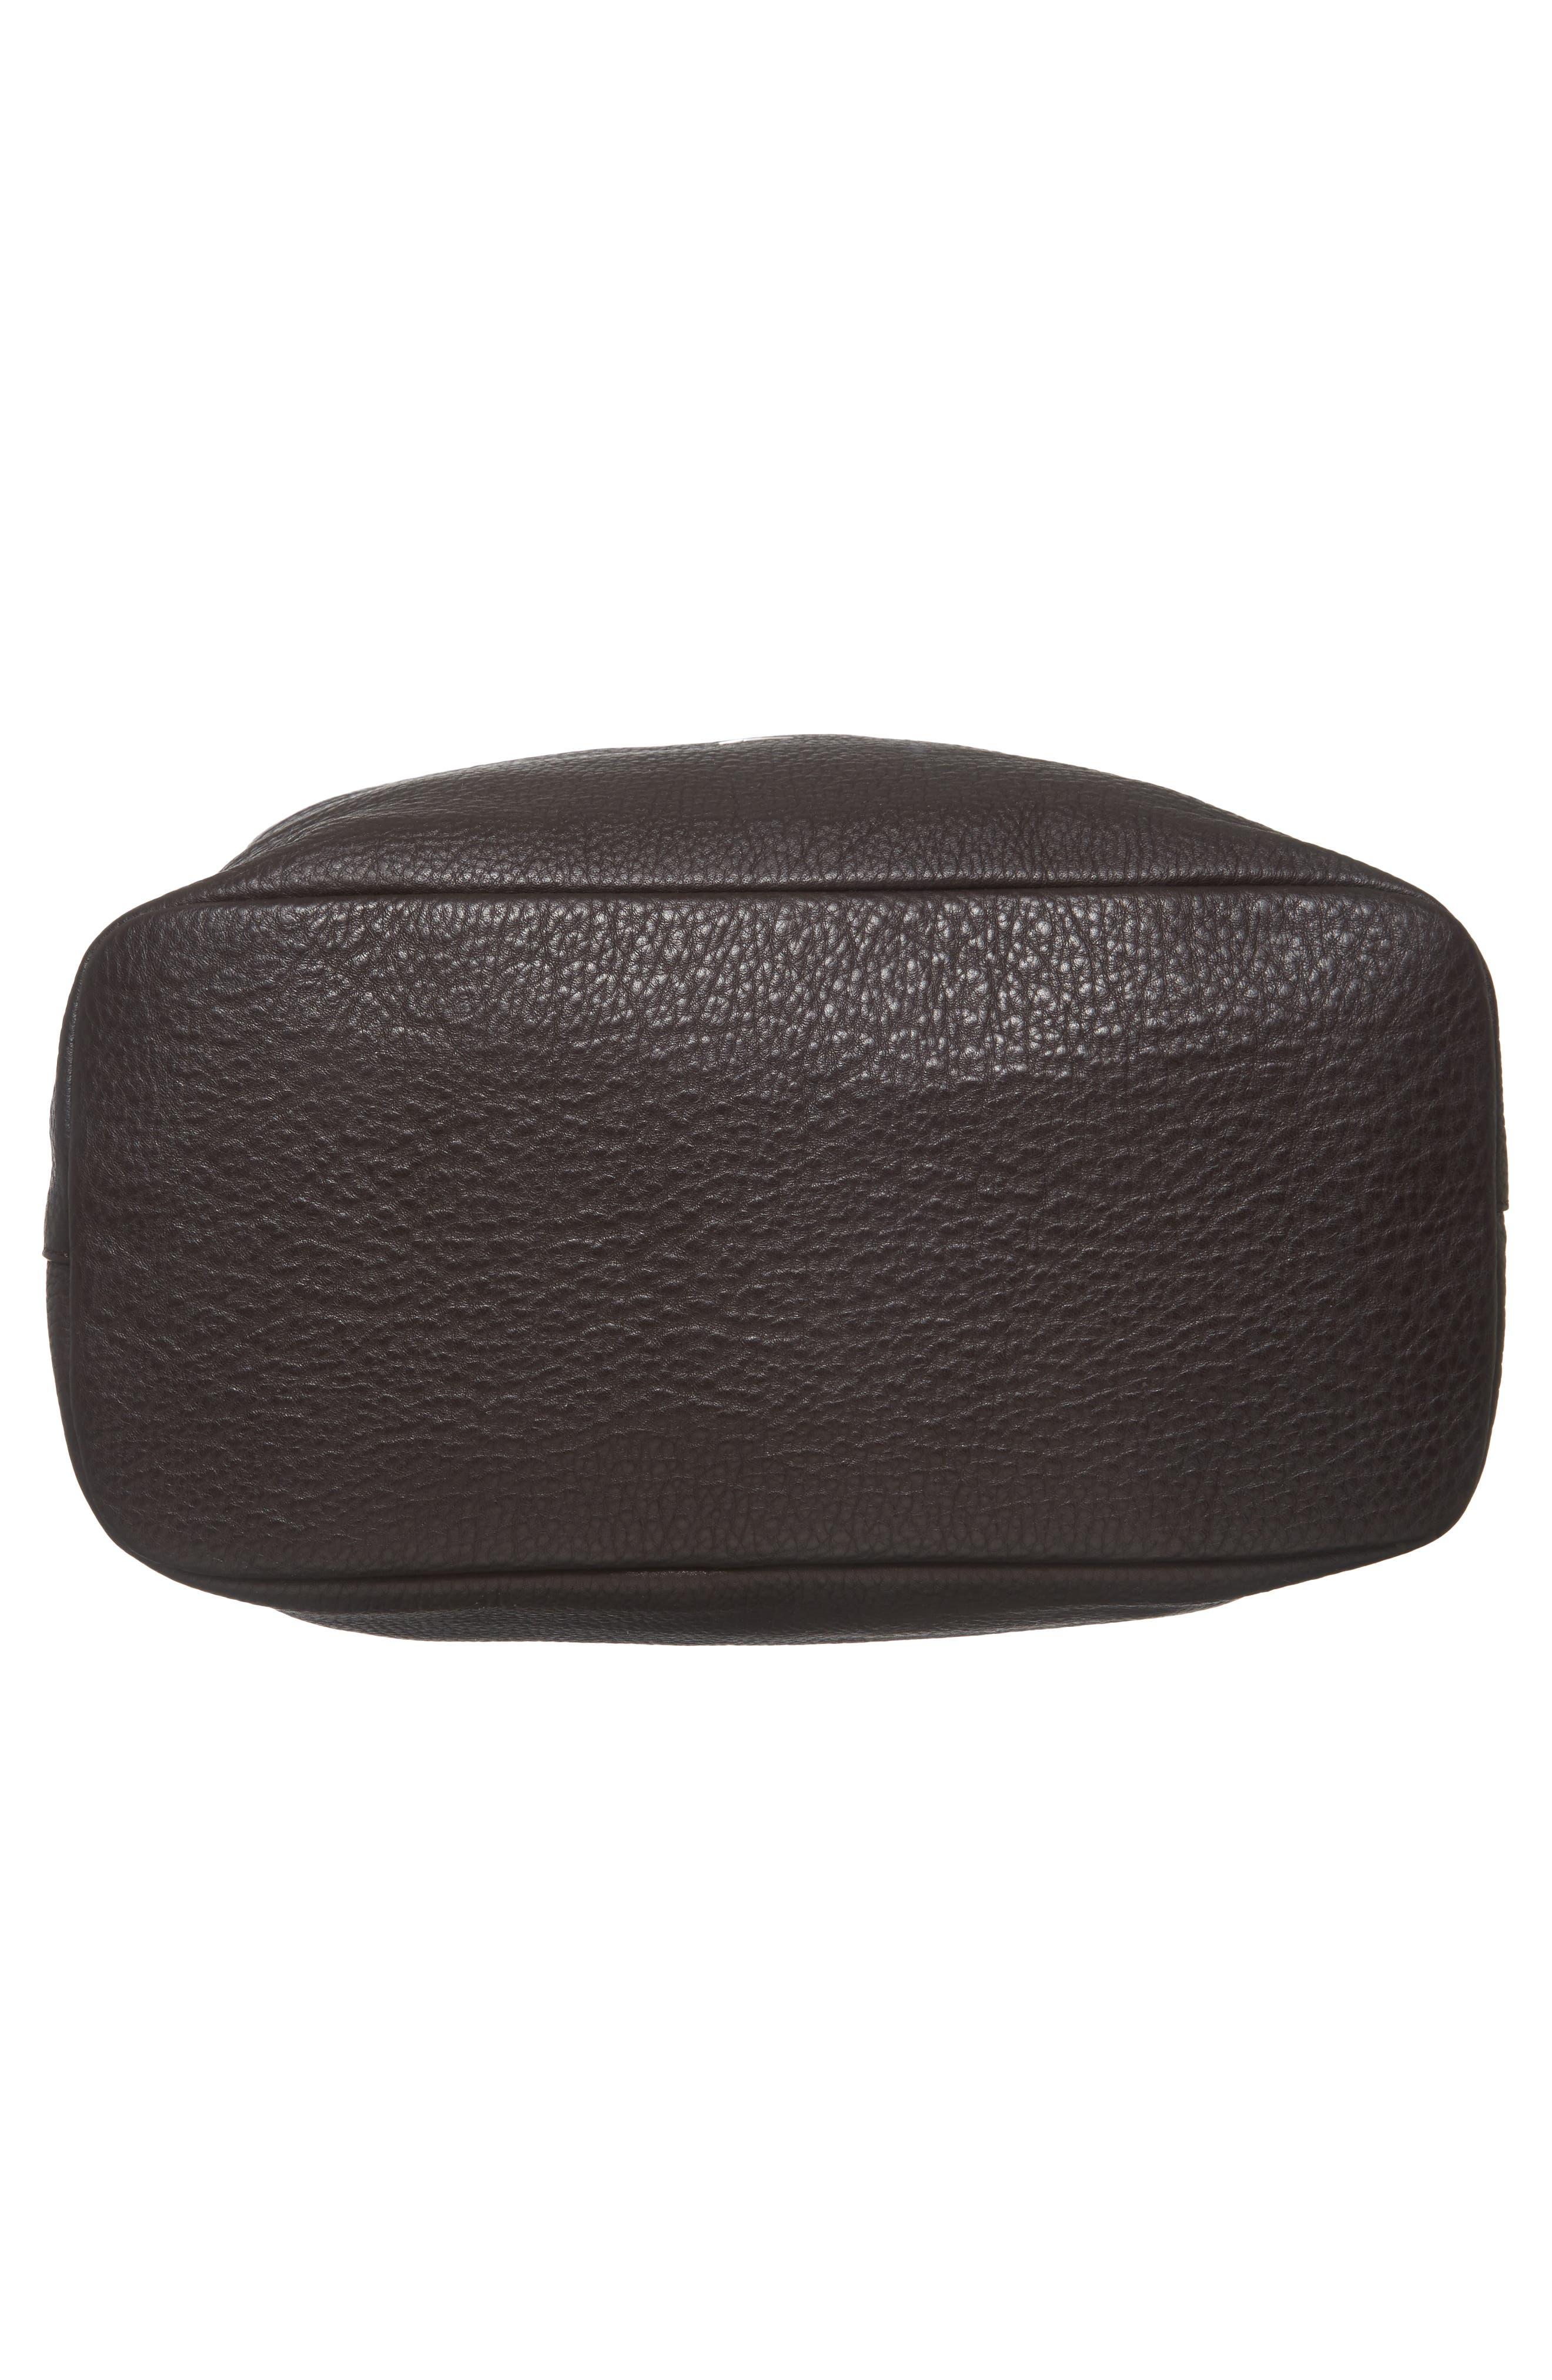 Relaxed Calfskin Leather Hobo Bag,                             Alternate thumbnail 6, color,                             240